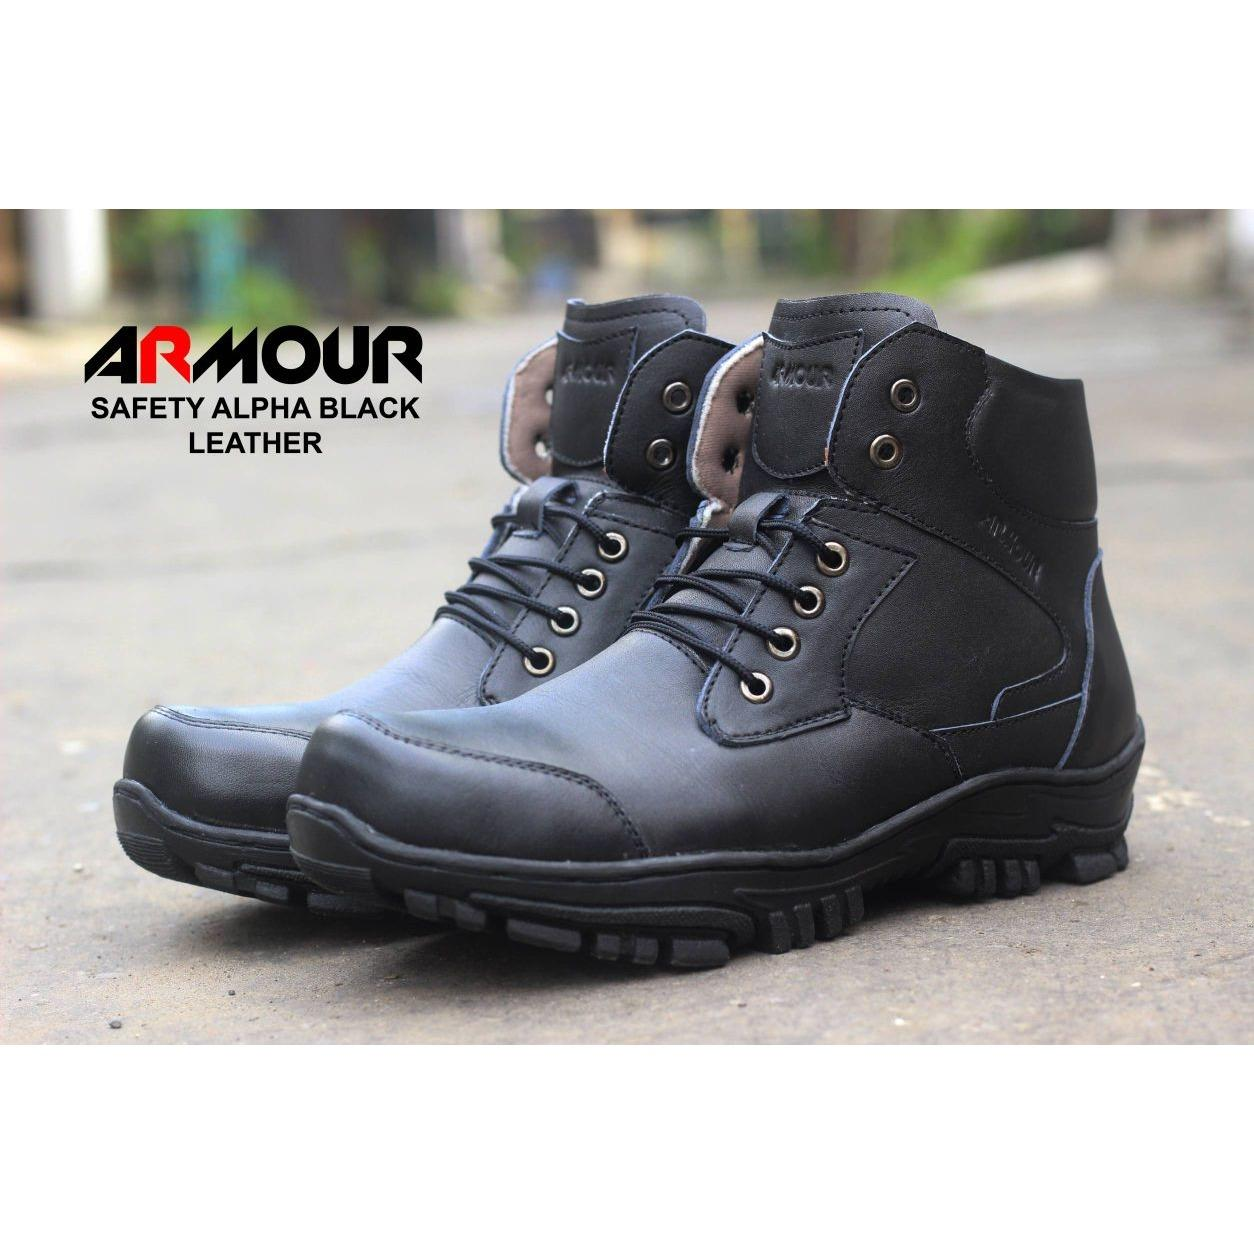 Sepatu Boots Safety Pria armour Kicker BRV / Hiking / Gunung / Touring / Semi Boots / Casual Cowok / Murah kulit asli PDL pendek tentara sepatu tactical gaul